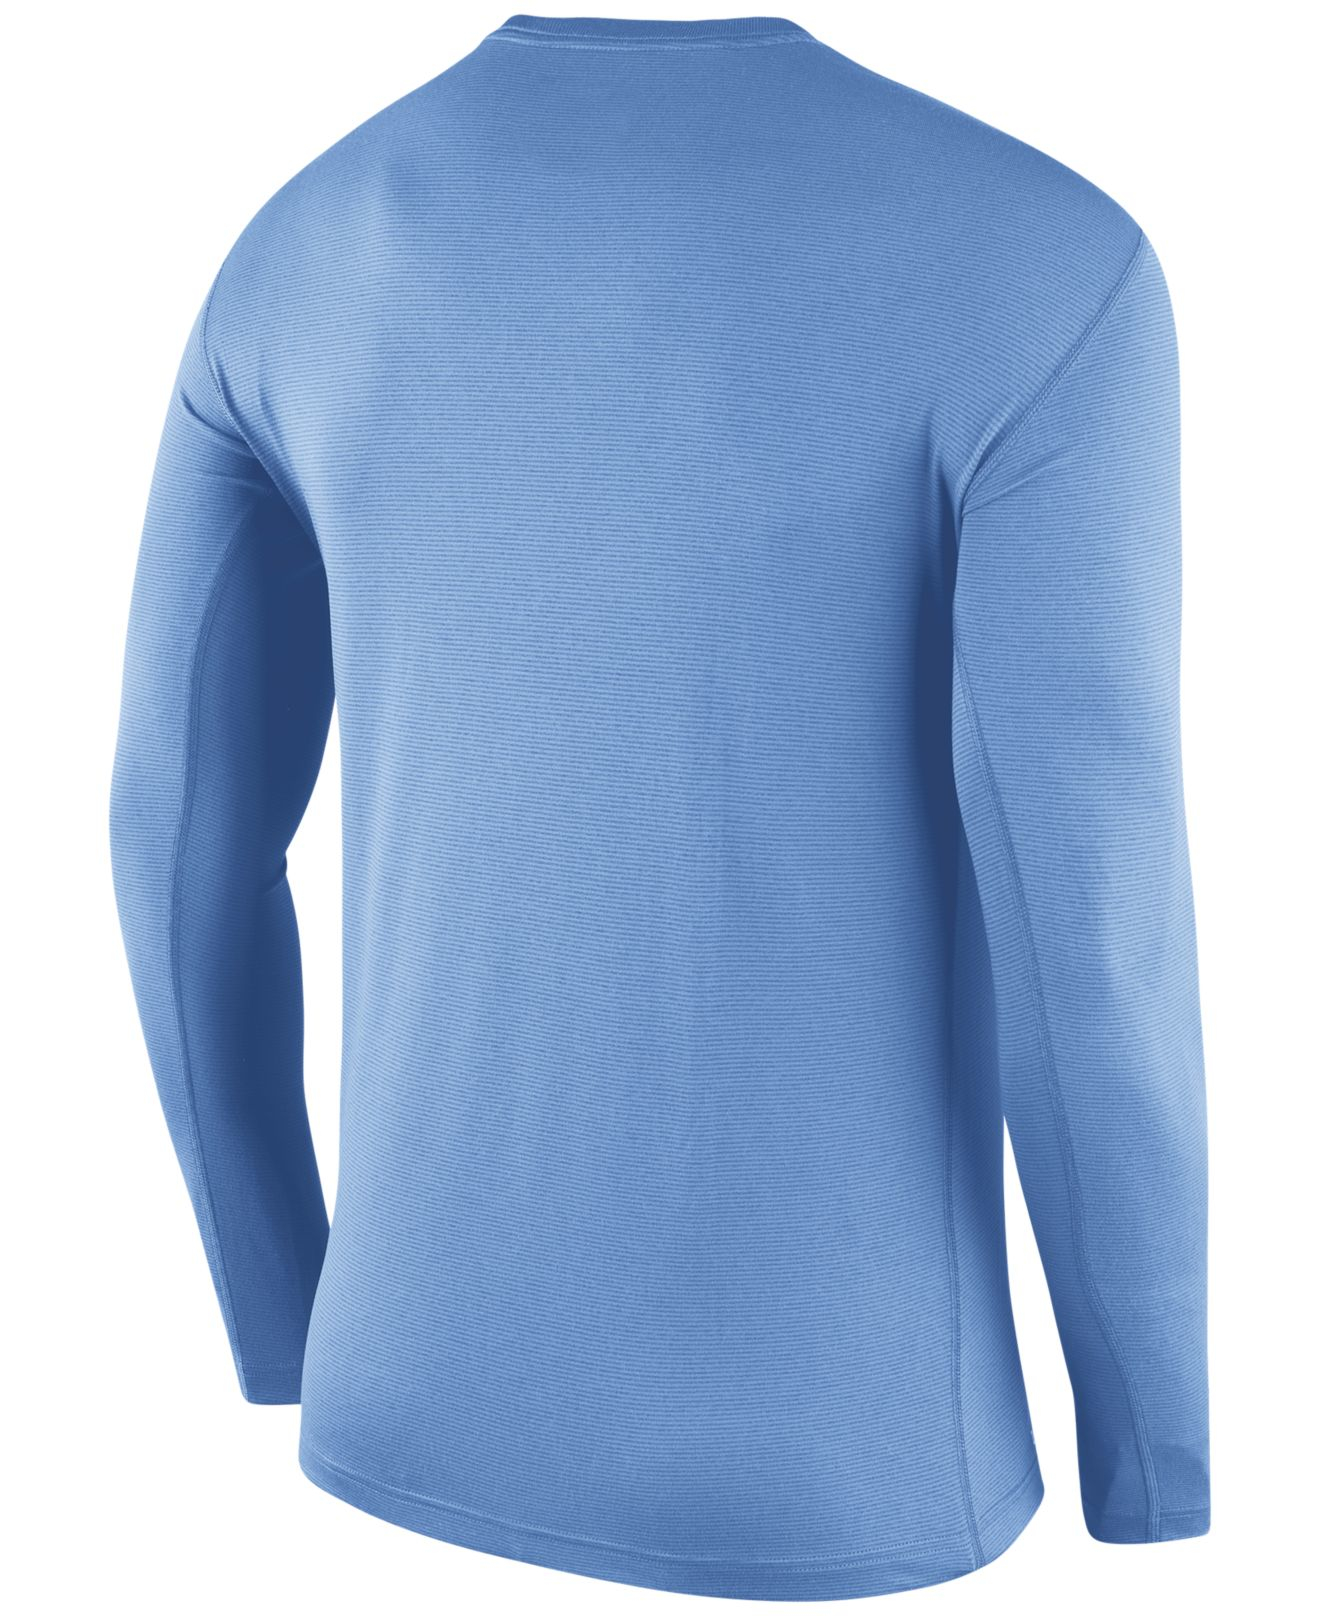 6021ff01 Nike Men's Long-sleeve North Carolina Tar Heels Stadium Dri-fit ...